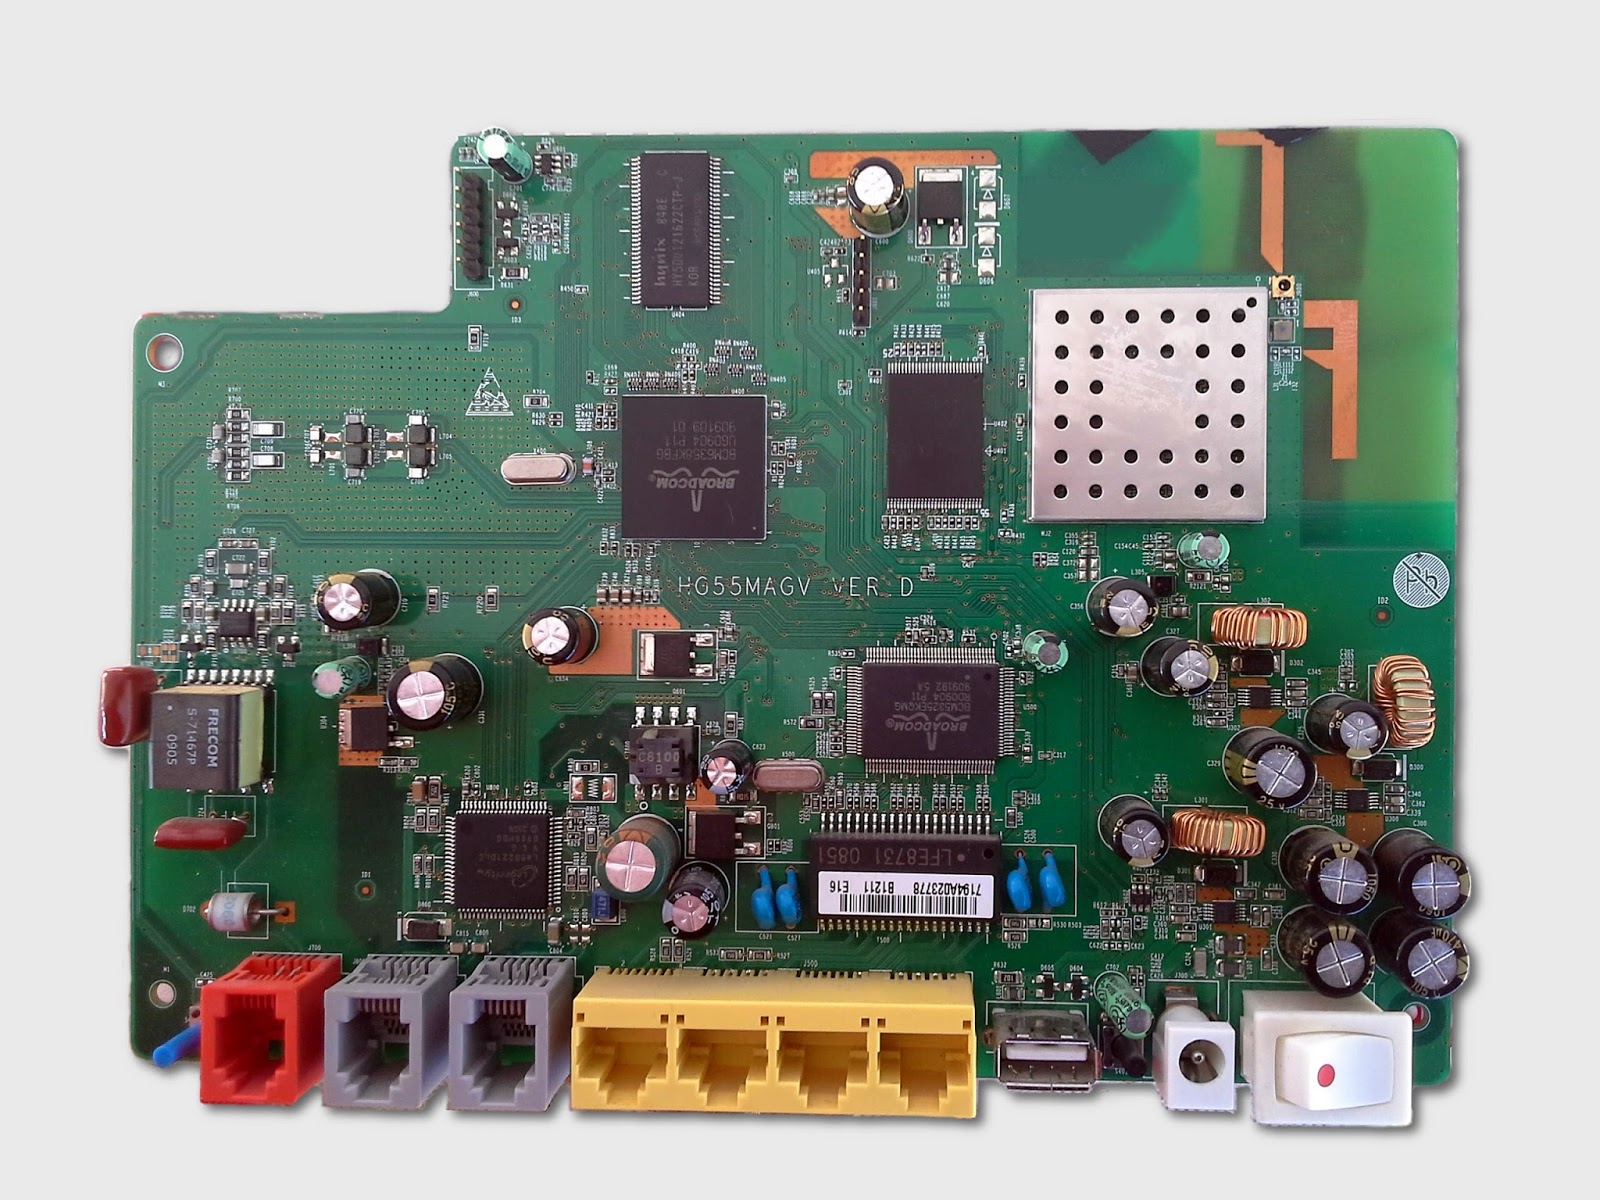 Debrick Huawei HG553 (BCM6358 based router) · One Transistor